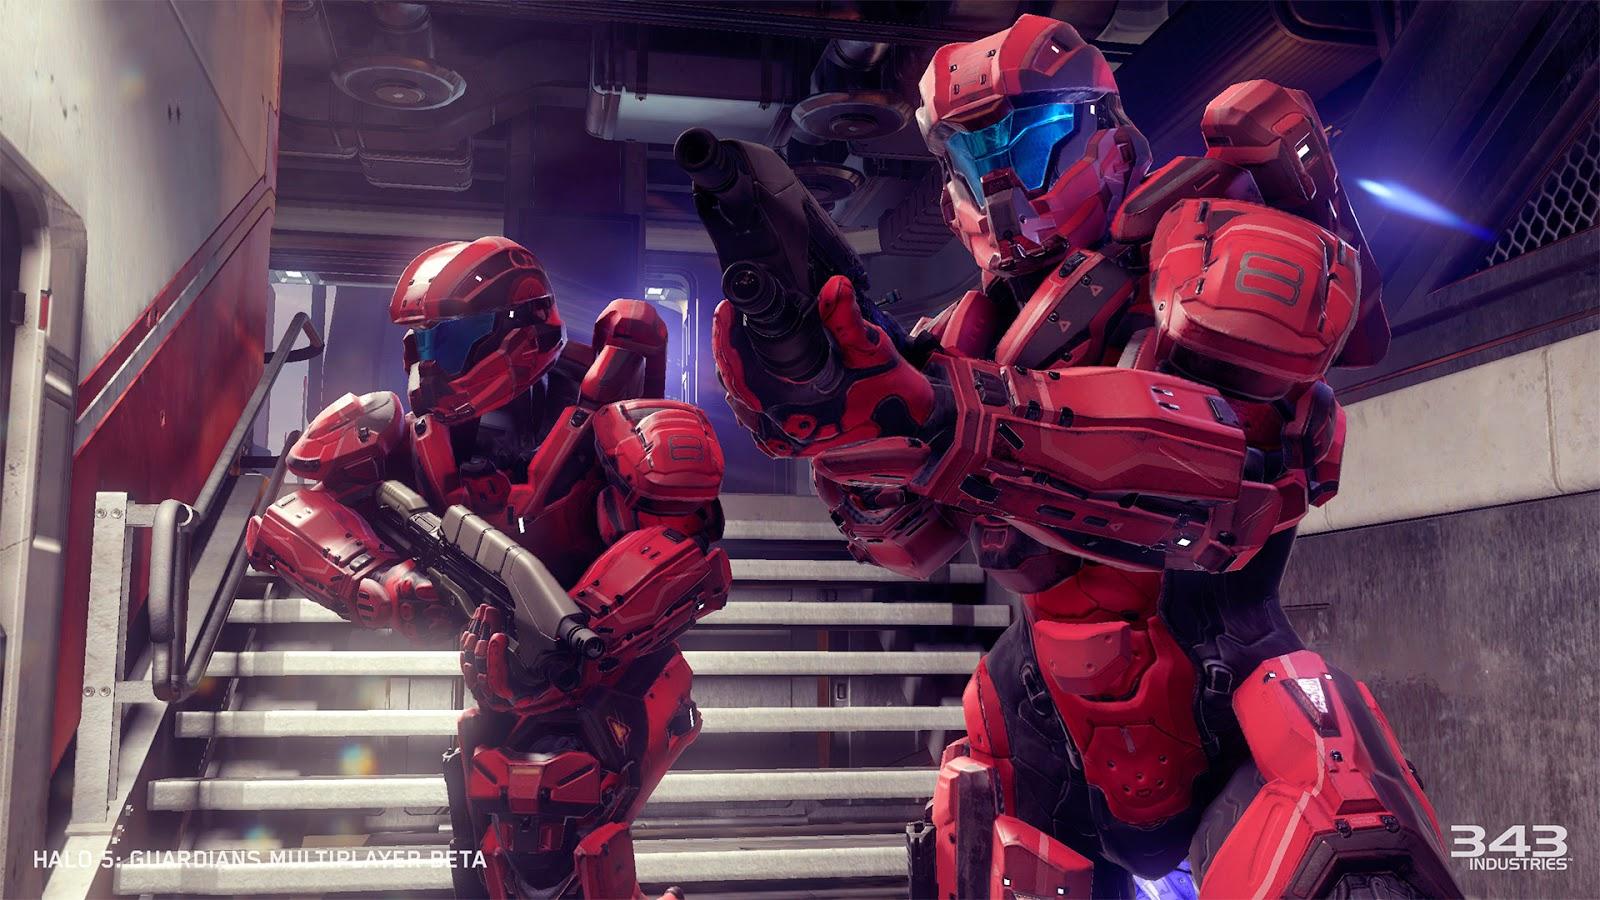 Somnambulant Gamer: Halo 5 Multiplayer Beta And the Master Chief